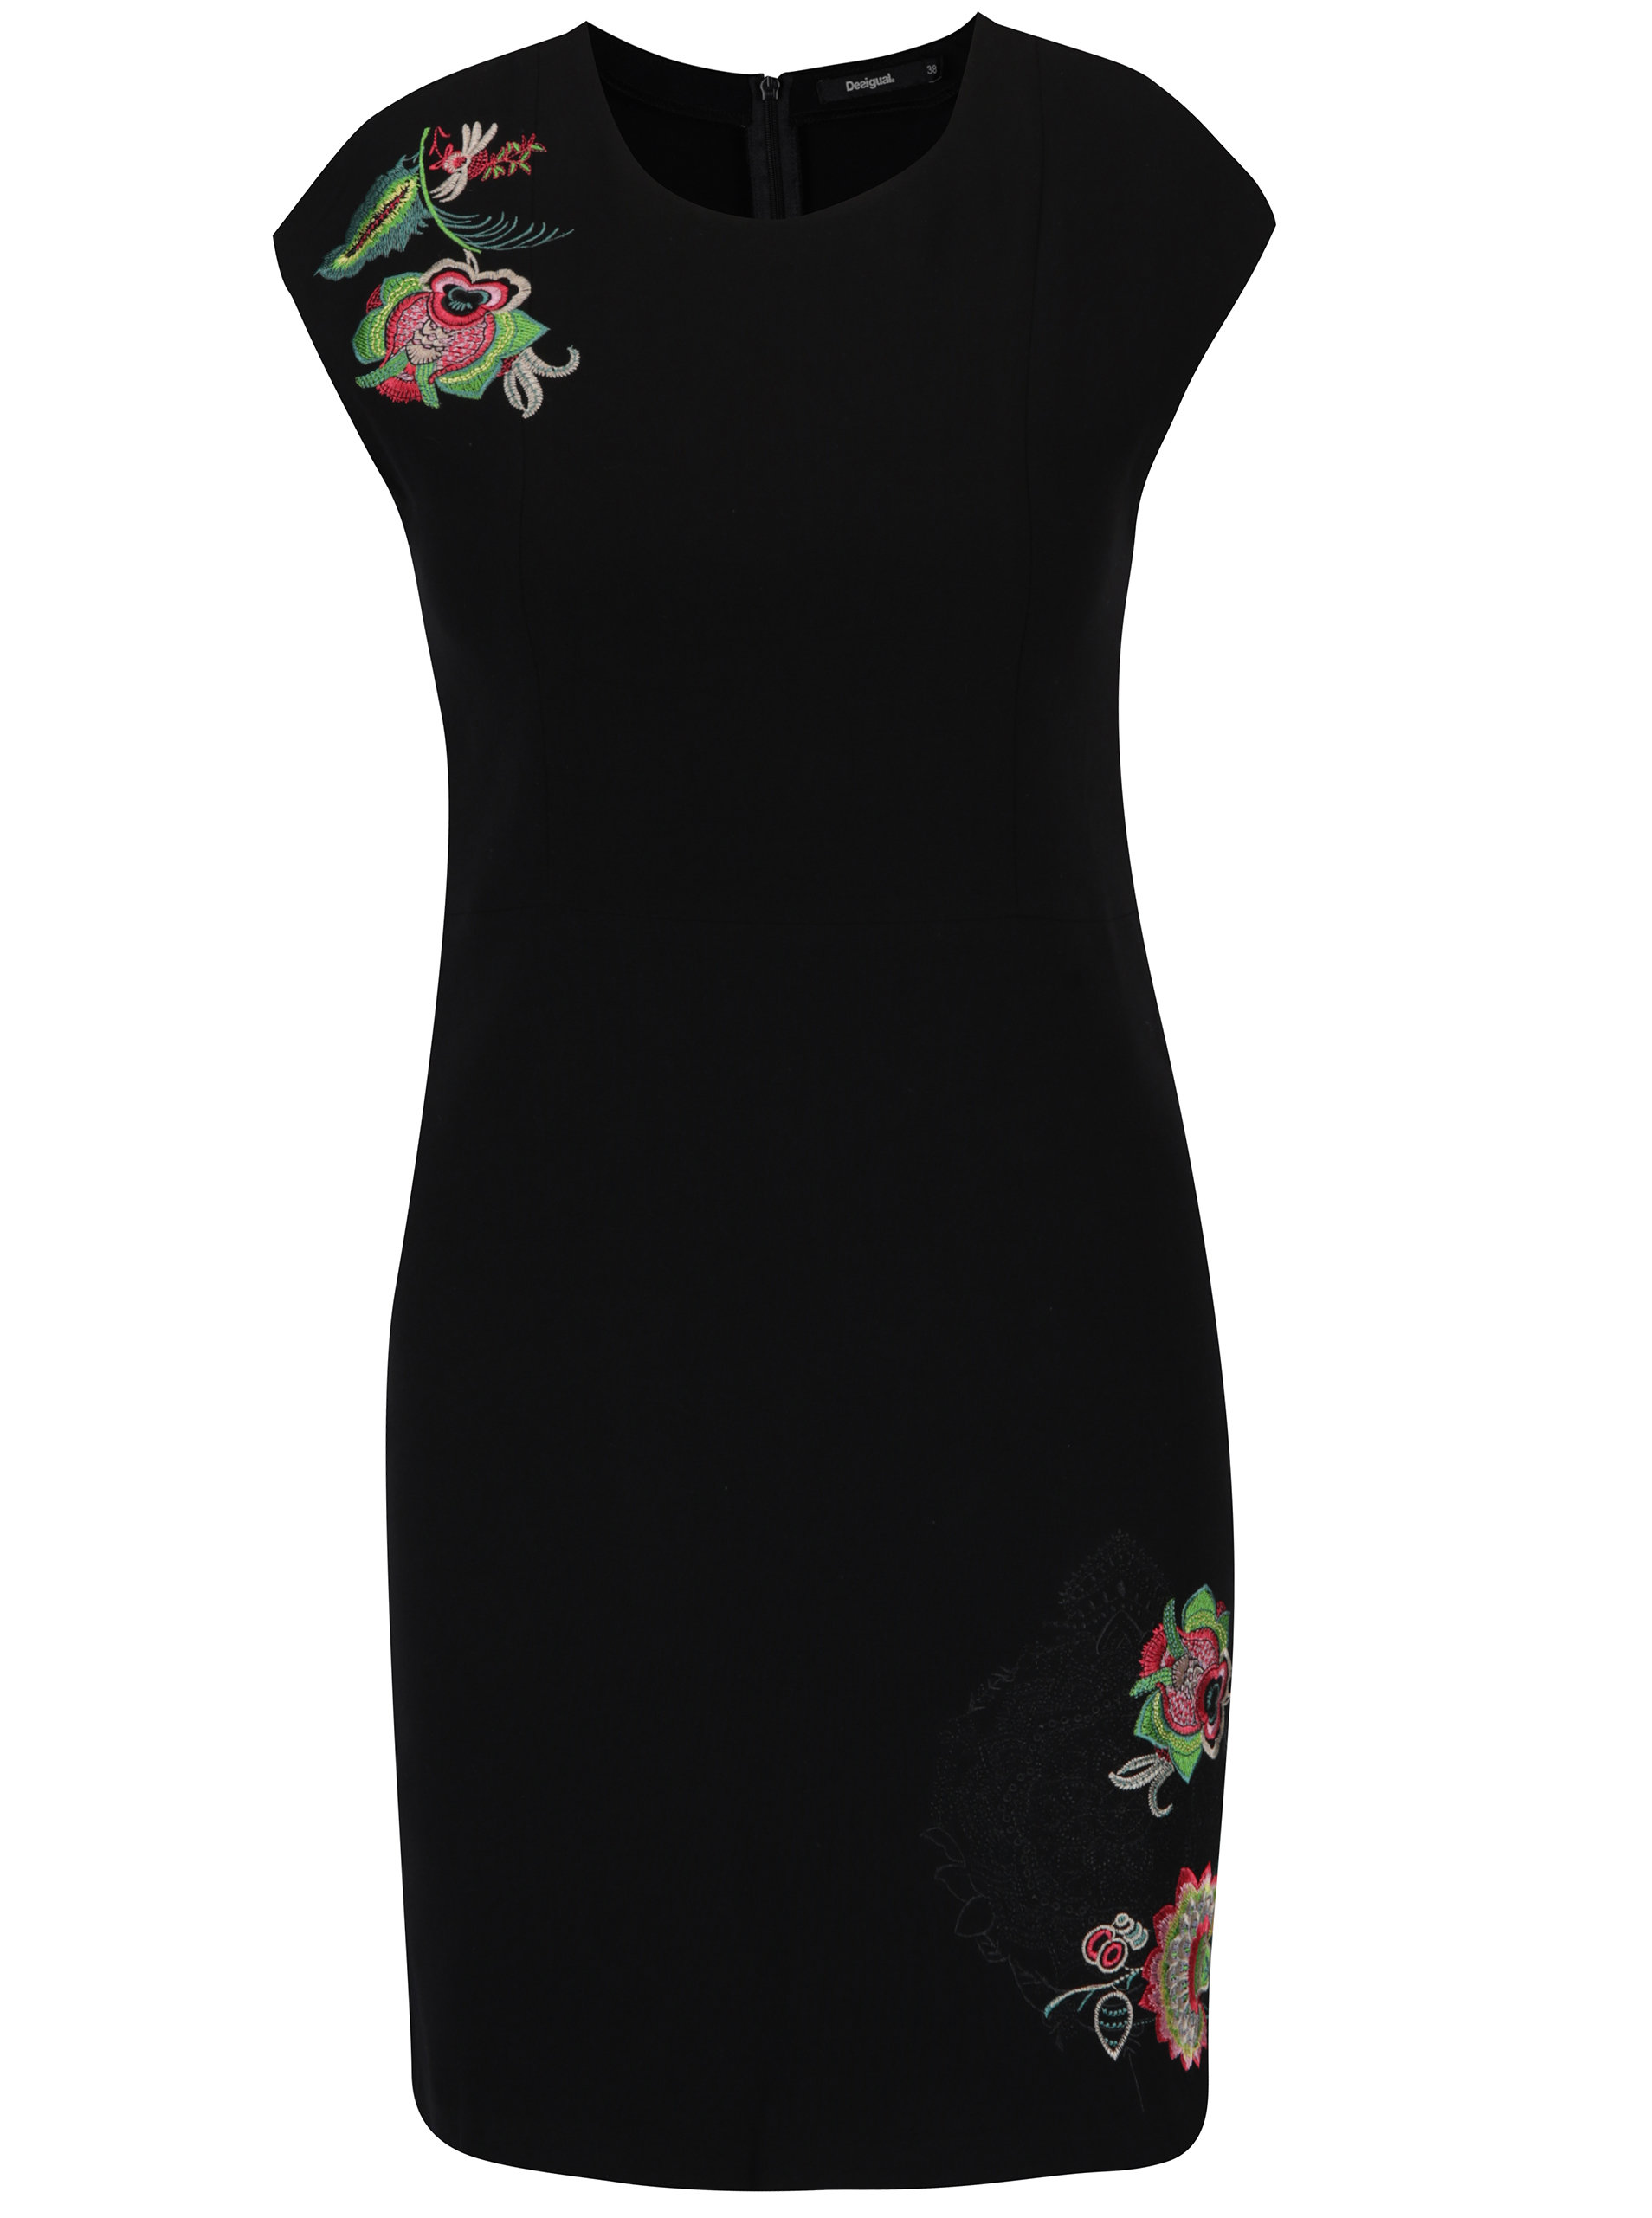 9248223f587 Černé pouzdrové šaty s výšivkami Desigual Brendan ...